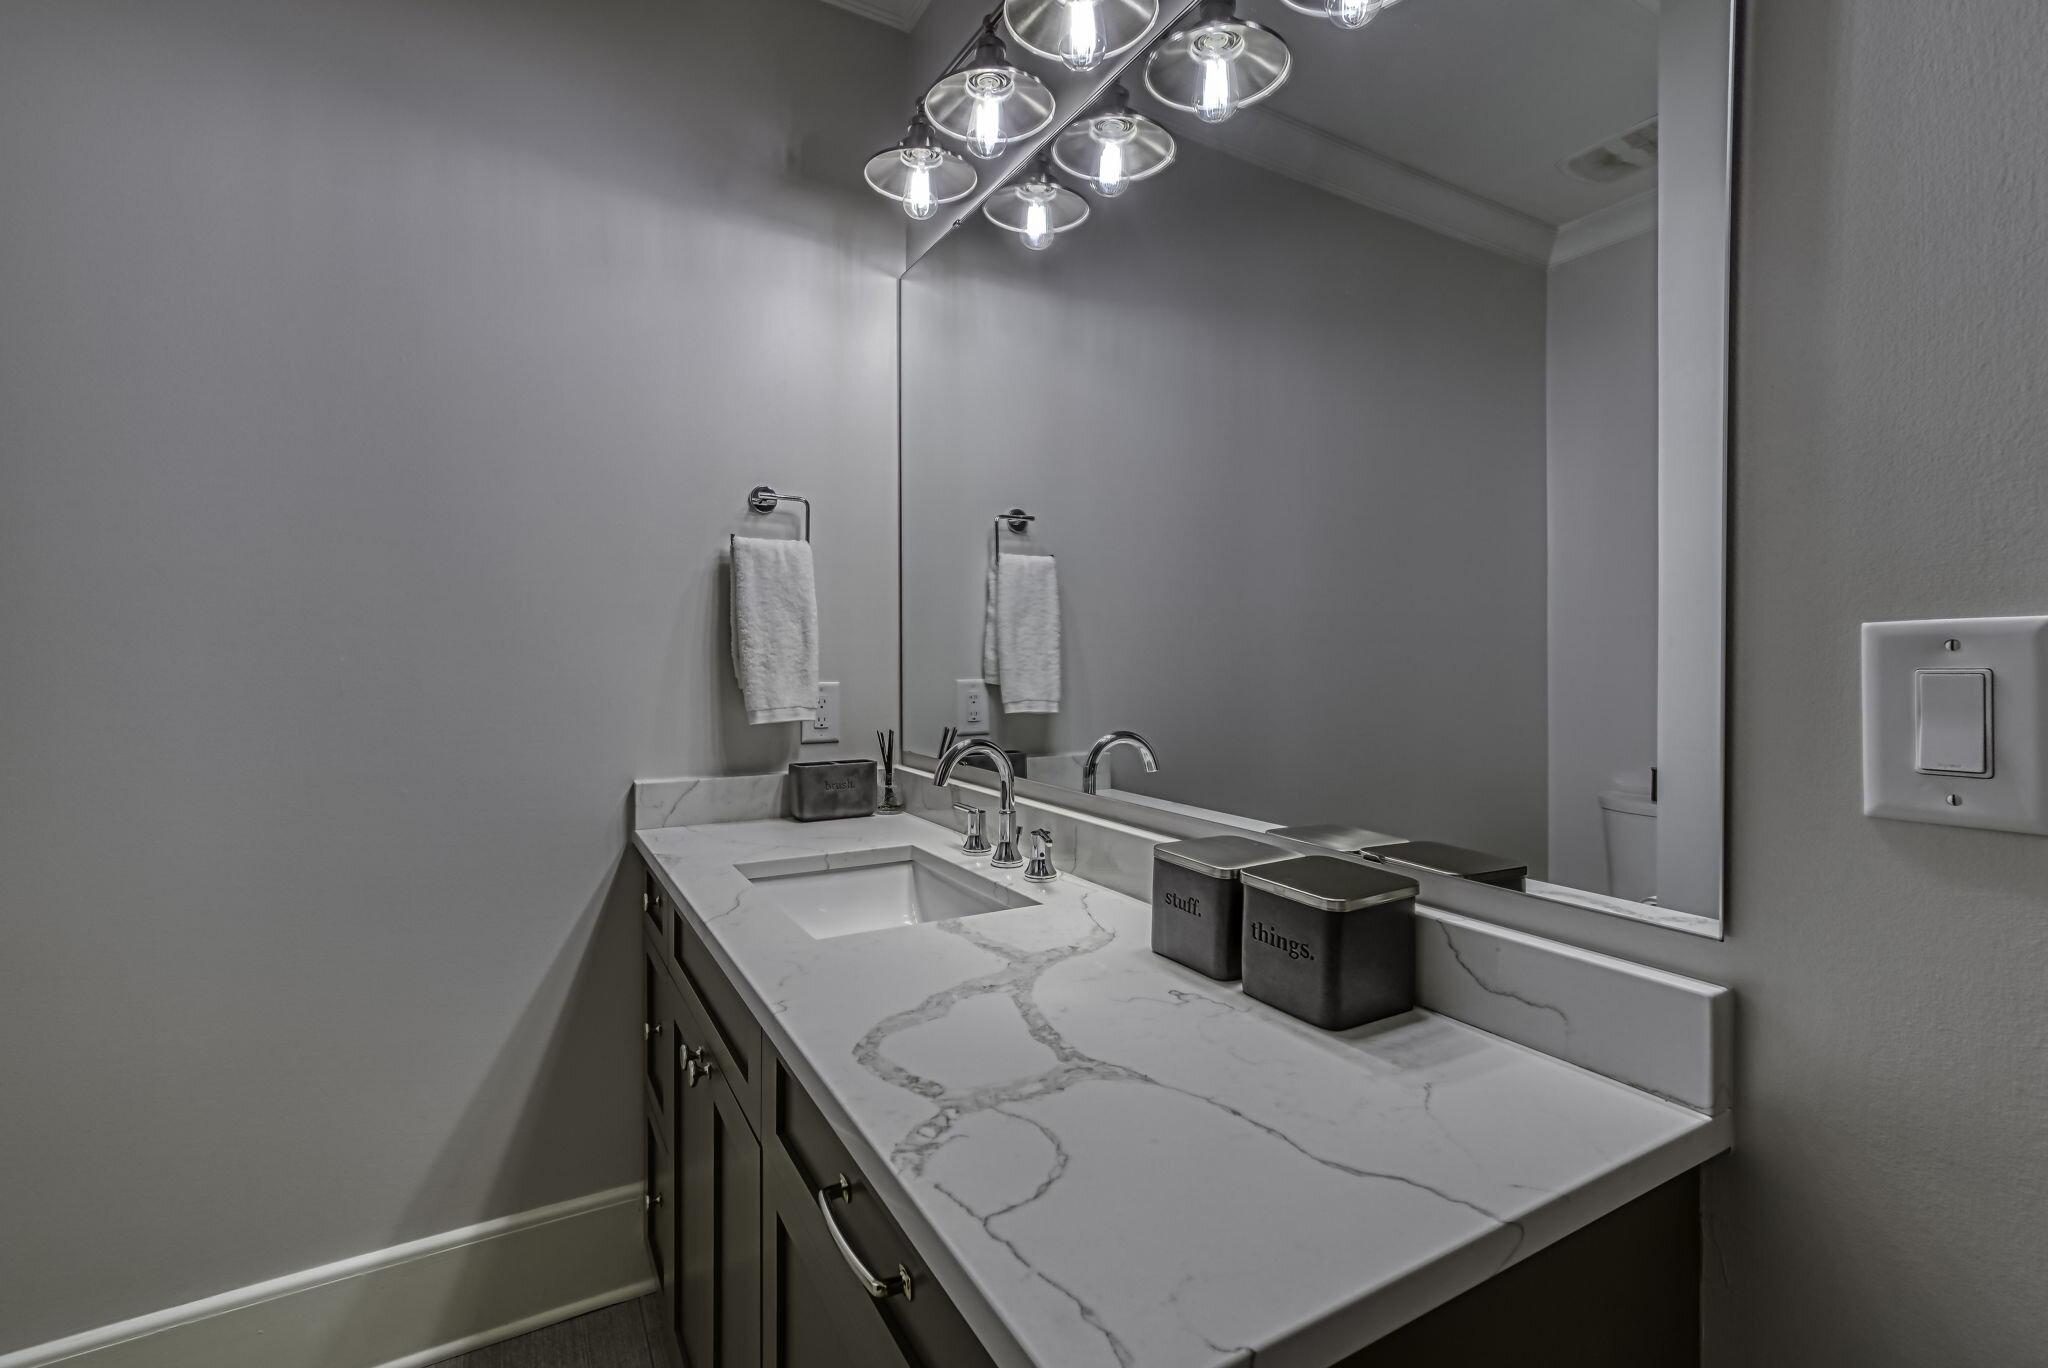 38-web-or-mls-4900 Carmel Park Dr Bedroom 5 Bath 1.jpg